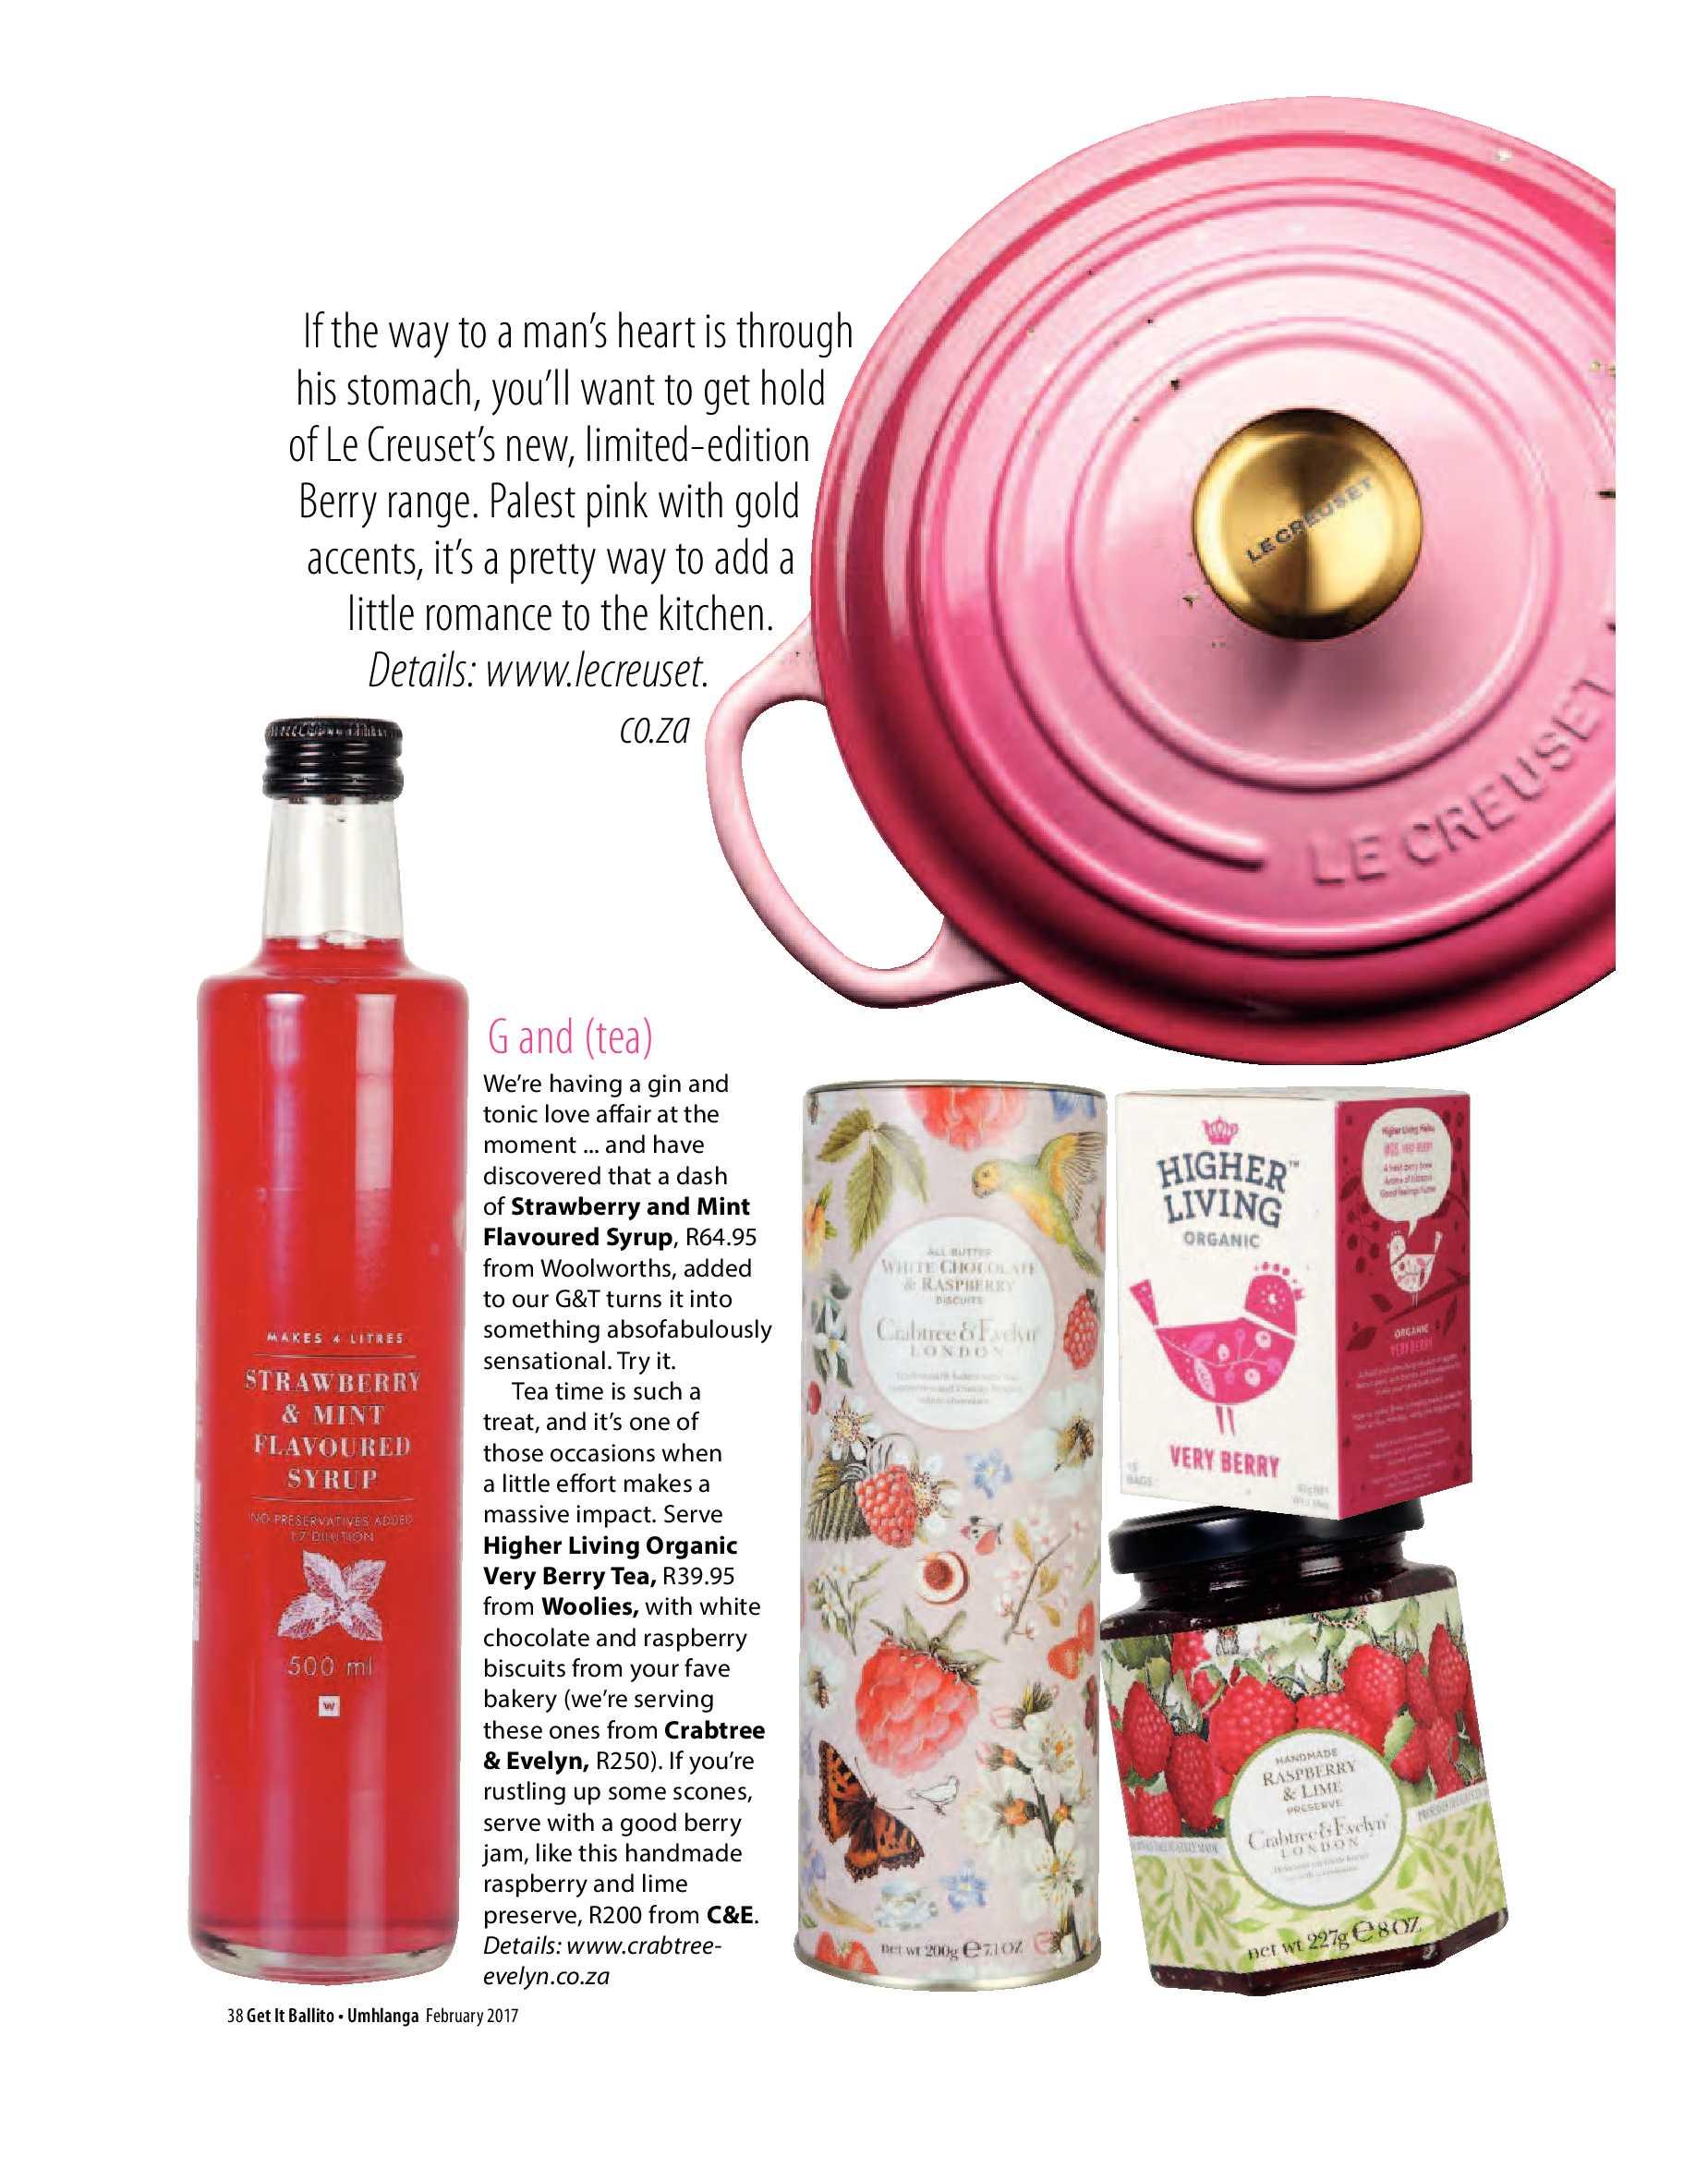 get-it-magazine-ballitoumhlanga-february-2017-epapers-page-40